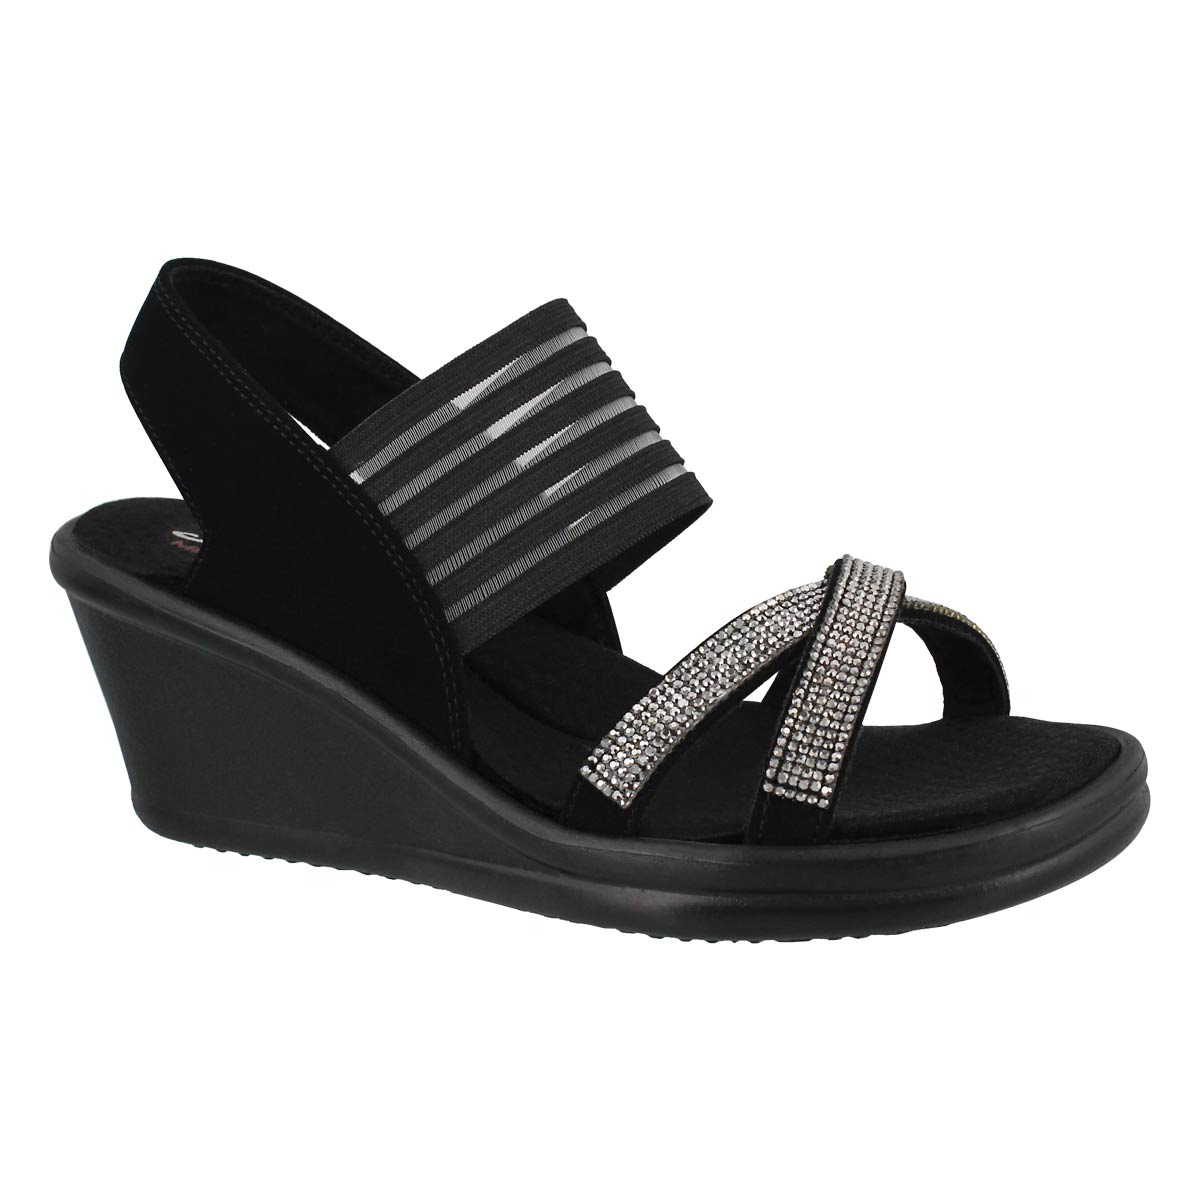 Lds Rumblers black rhinestone wdg sandal